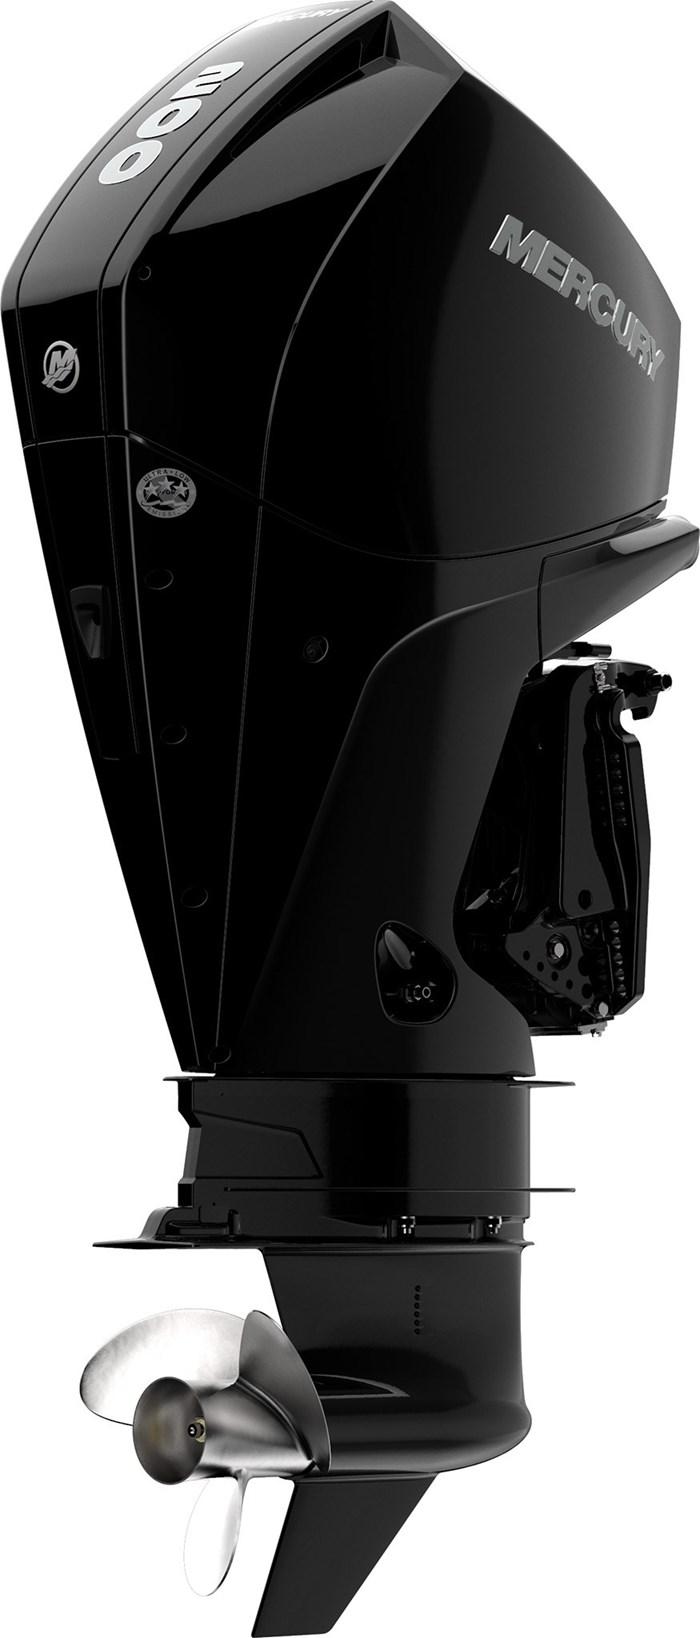 2020 Mercury 200CXL V-6 4-Stroke DTS Photo 9 of 24